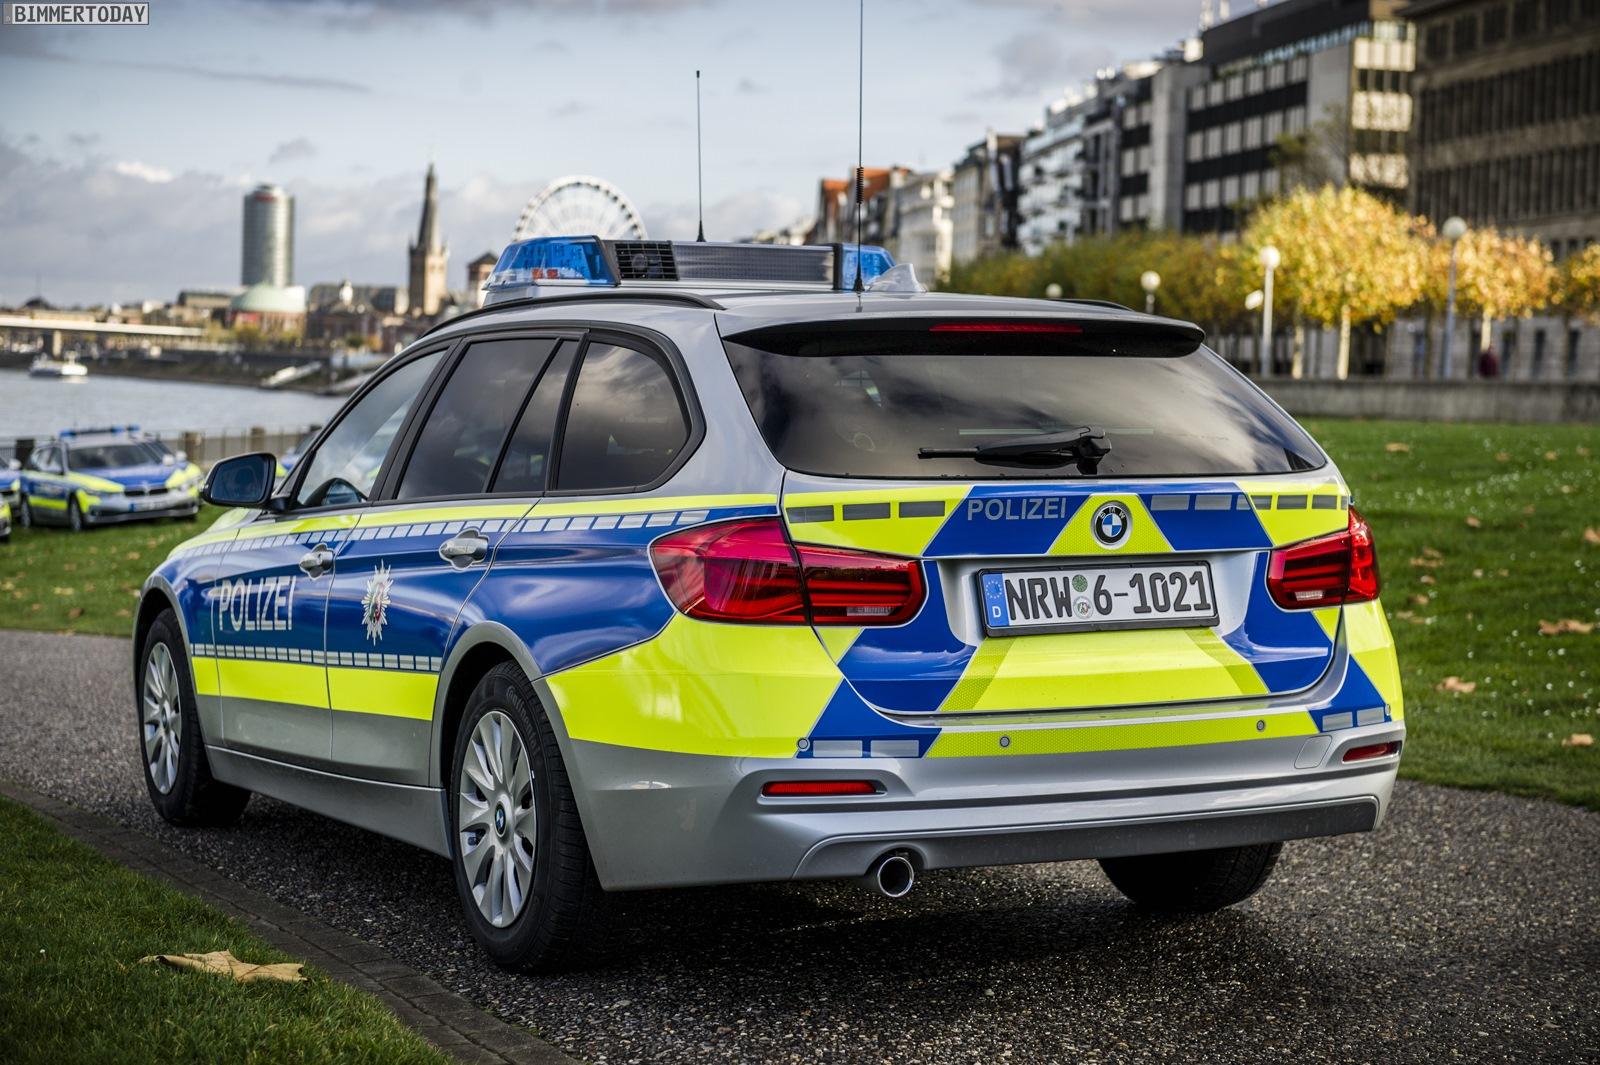 https://cdn.bimmertoday.de/wp-content/uploads/2015/11/Polizei-BMW-3er-Touring-F31-LCI-NRW-08.jpg